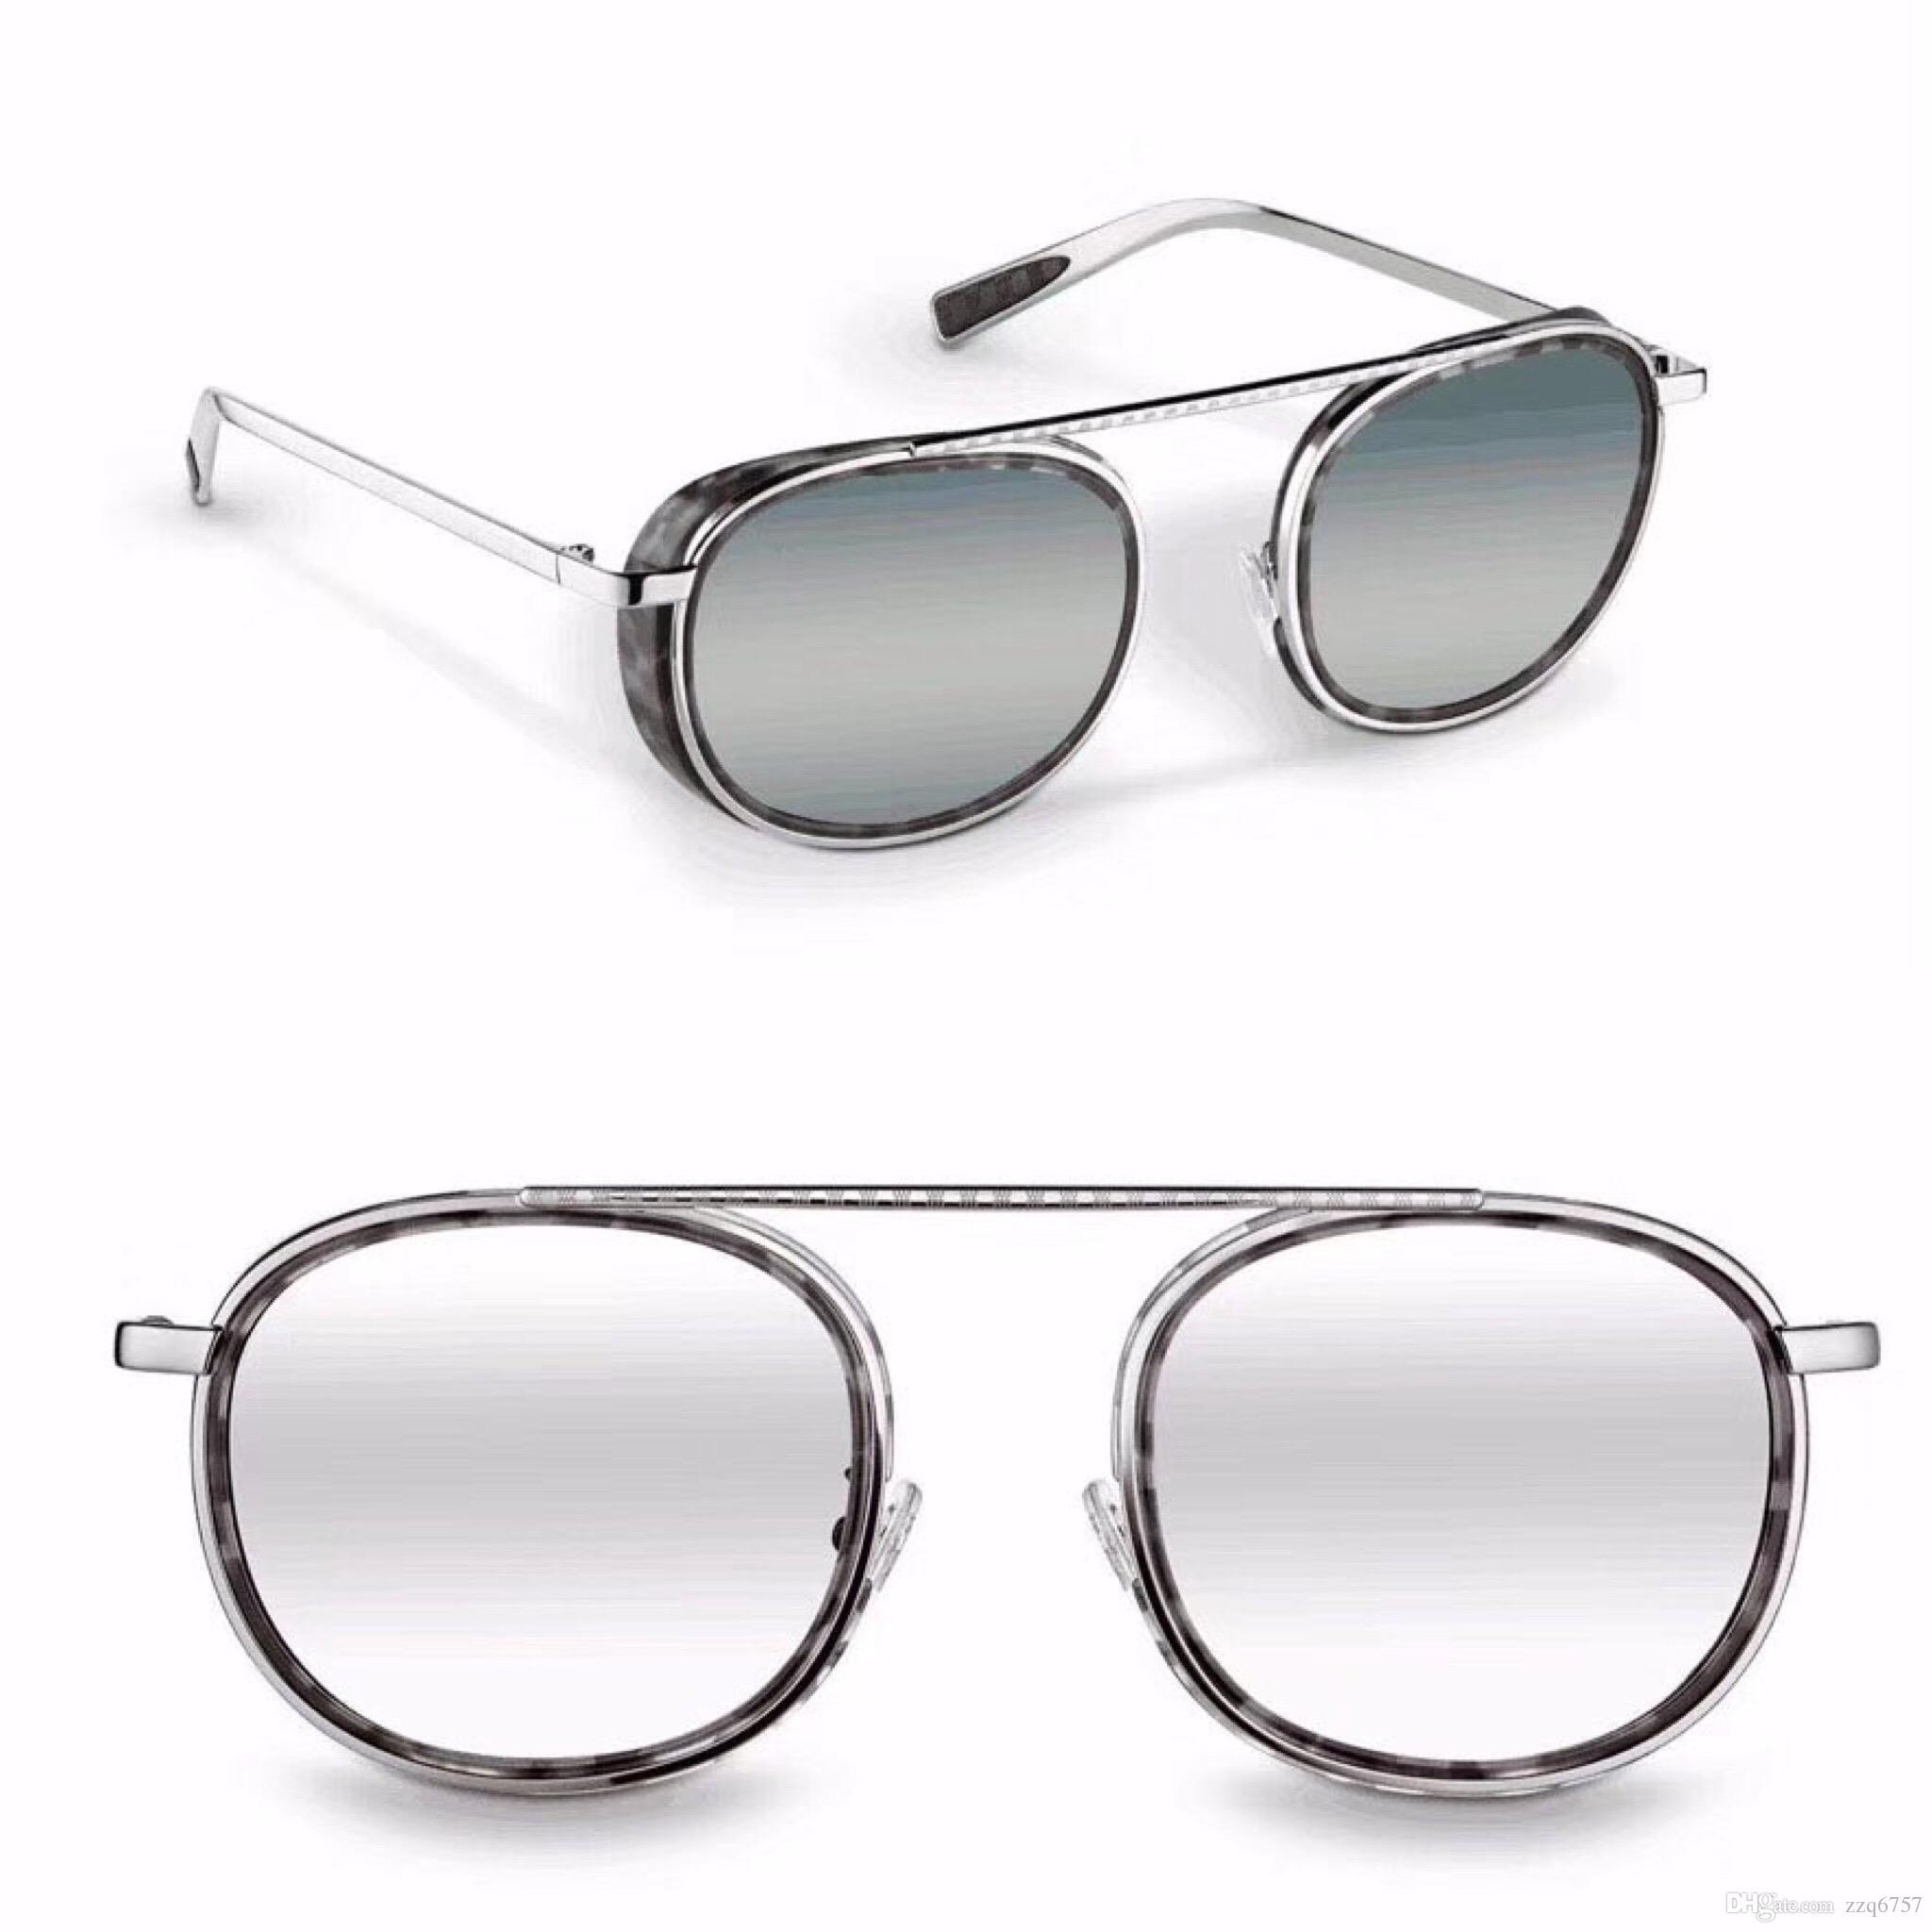 7b8937d6ce New Fashion Designer Sunglasses For Men LANAI Small Frame Modern And Street  Design Styles Uv400 Lens Outdoor Protection Eyewear Circle Sunglasses Glass  ...